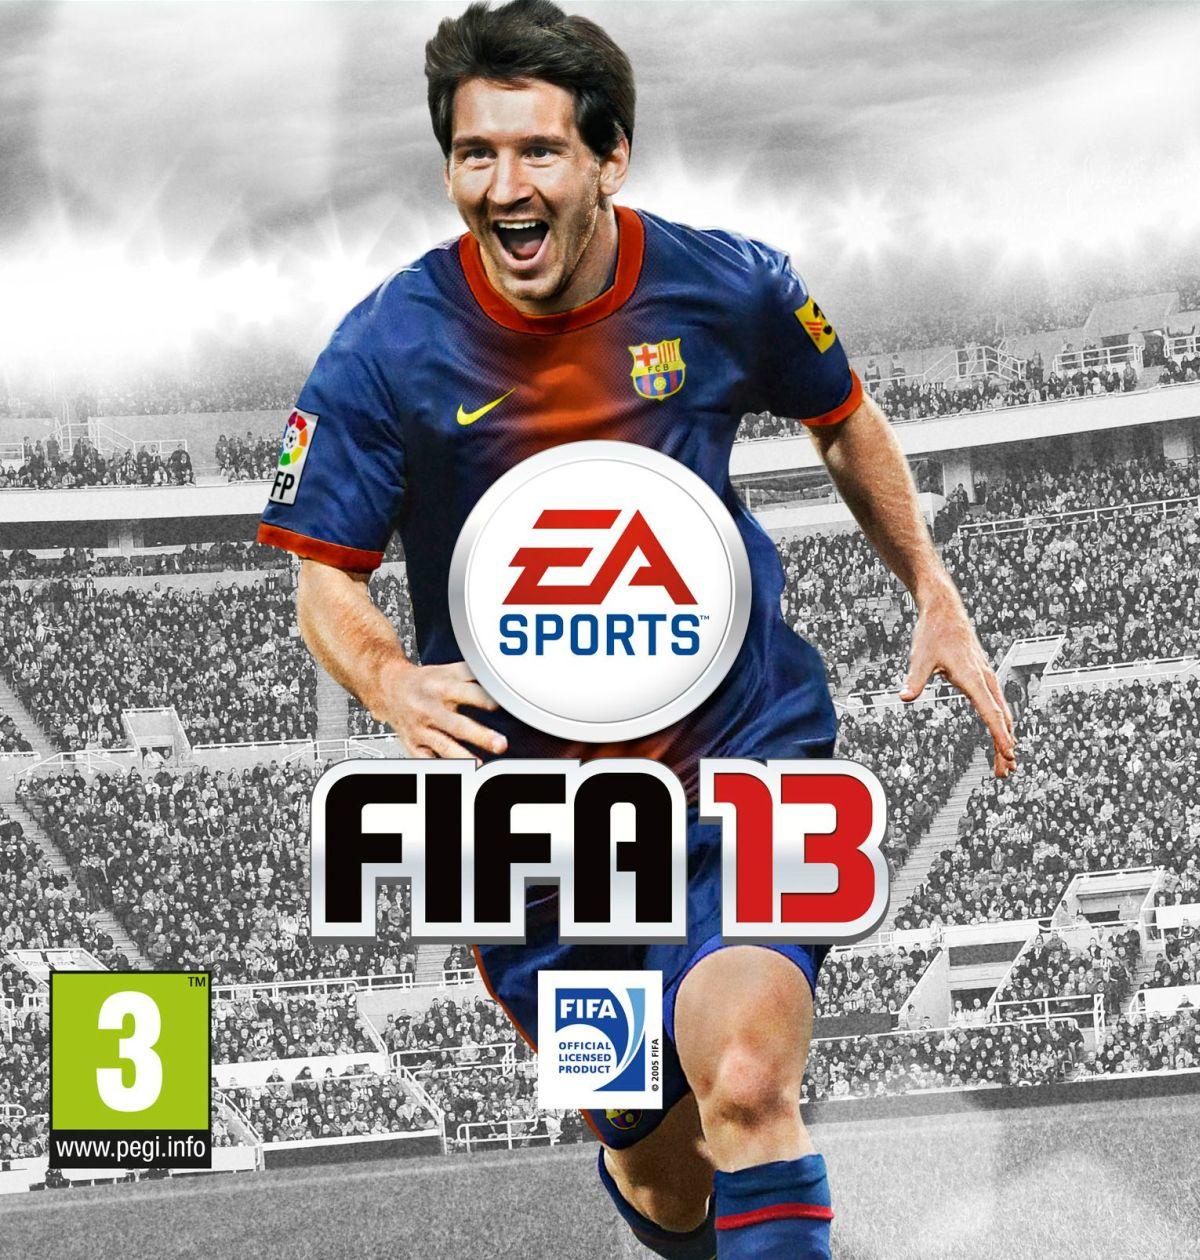 GAMECOIN - FIFA 13